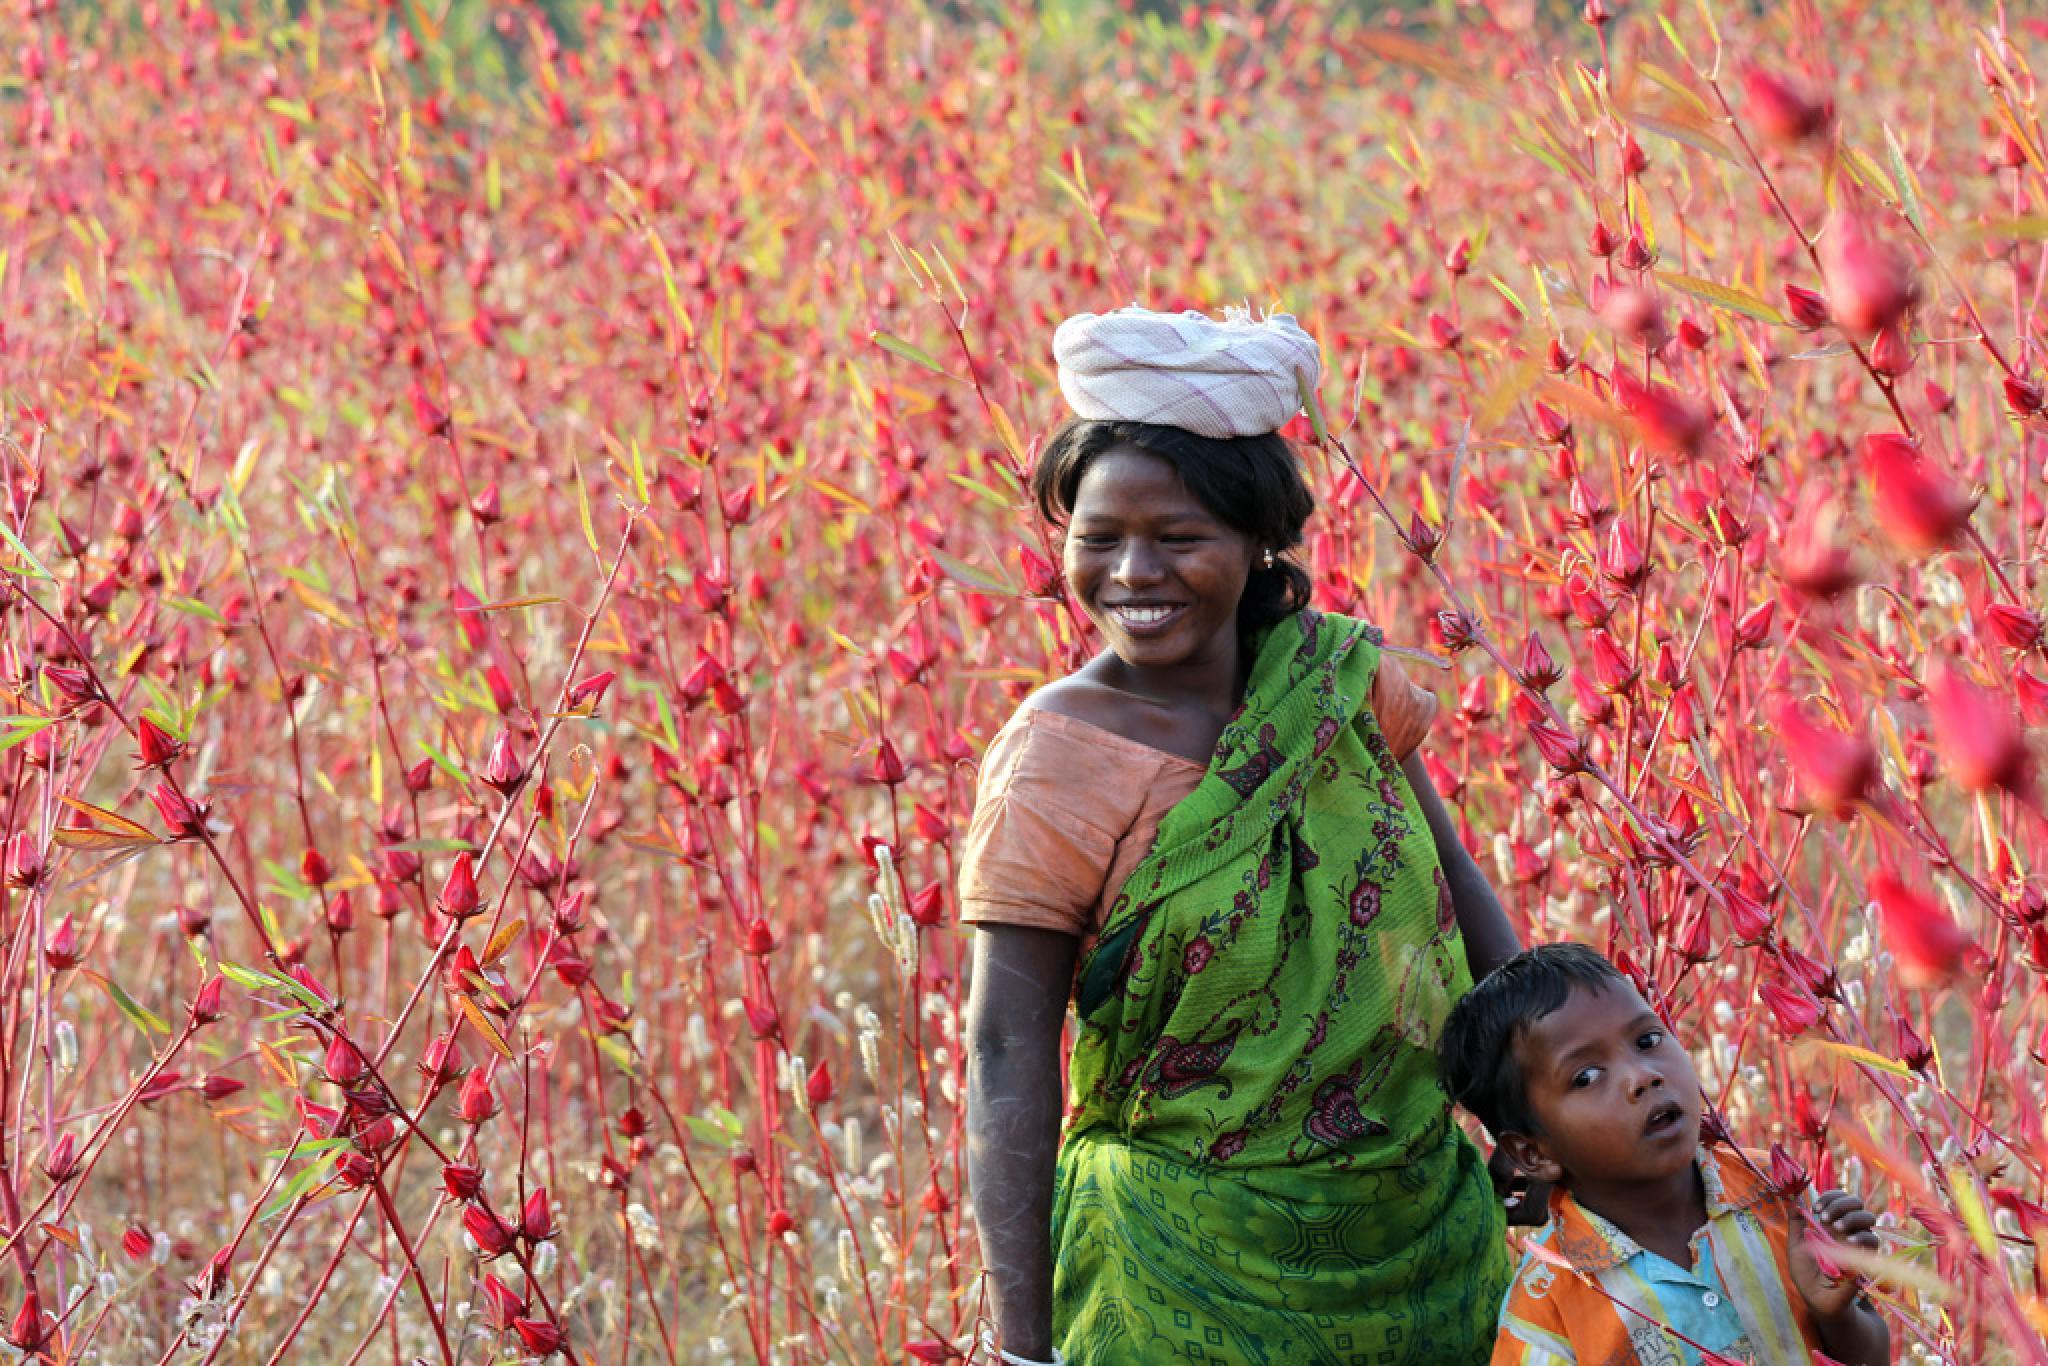 In The Field Of Flowers by Santosh Rajgarhia